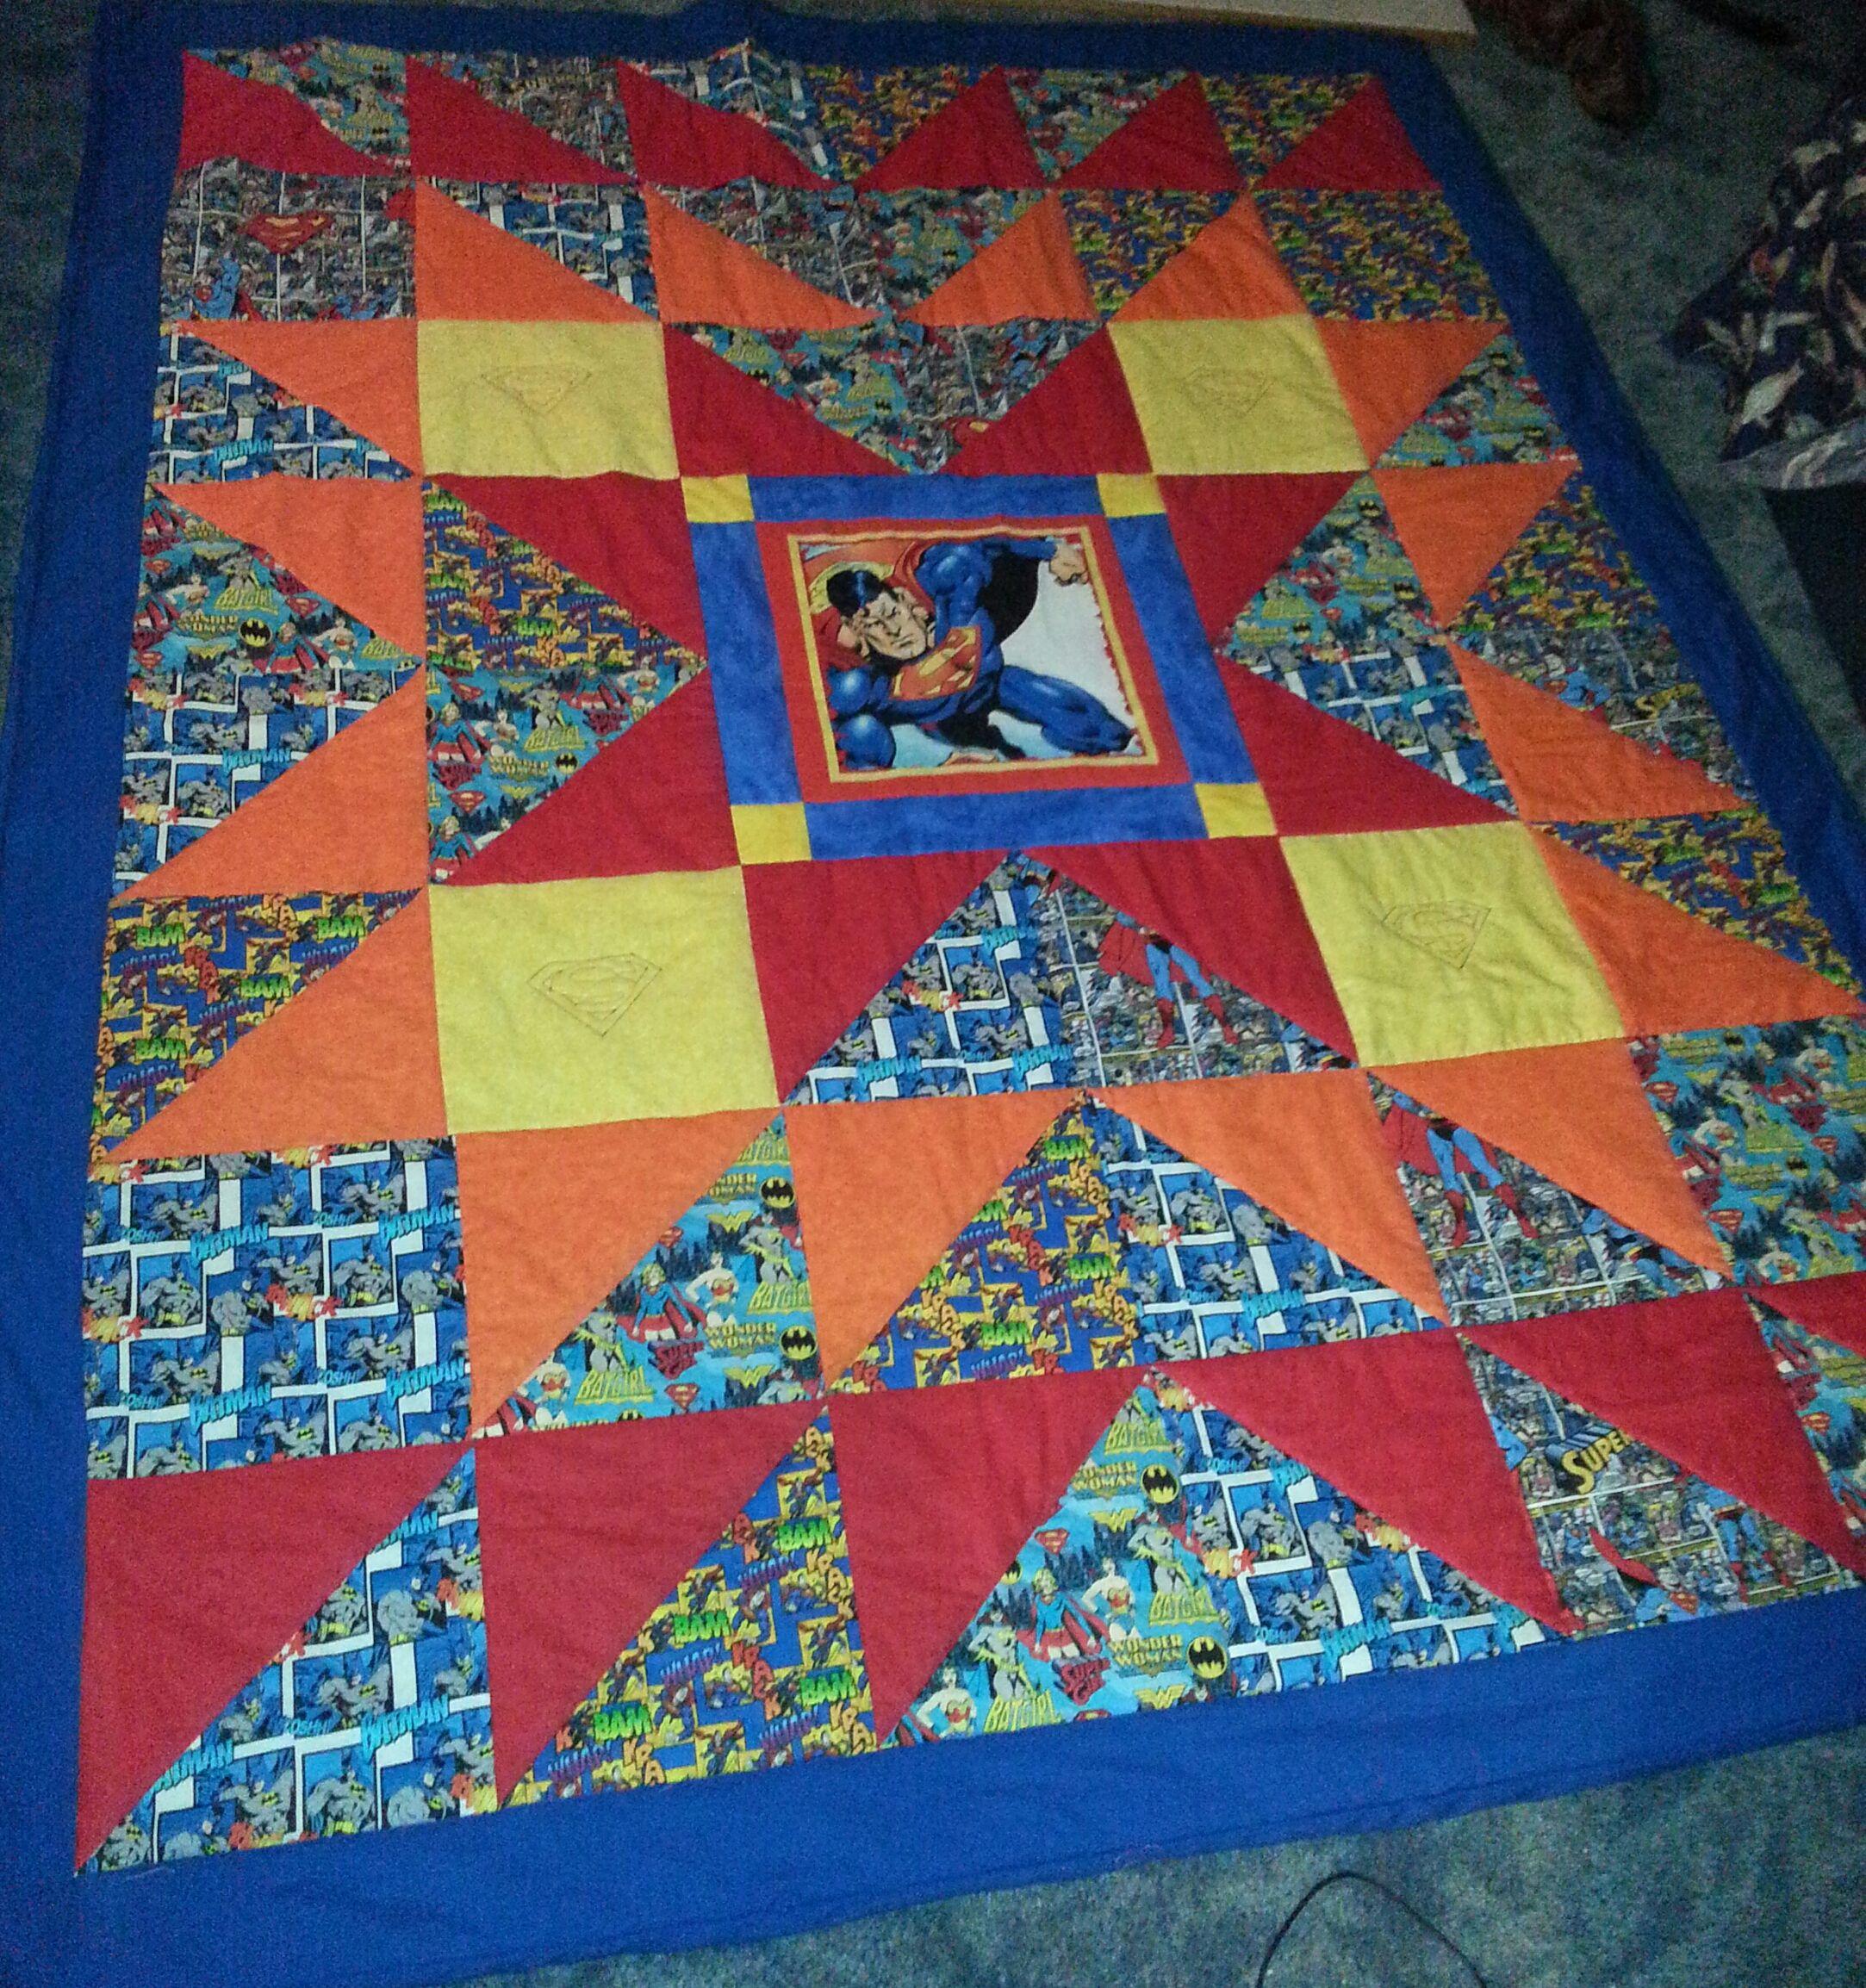 Superman Queen sized quilt